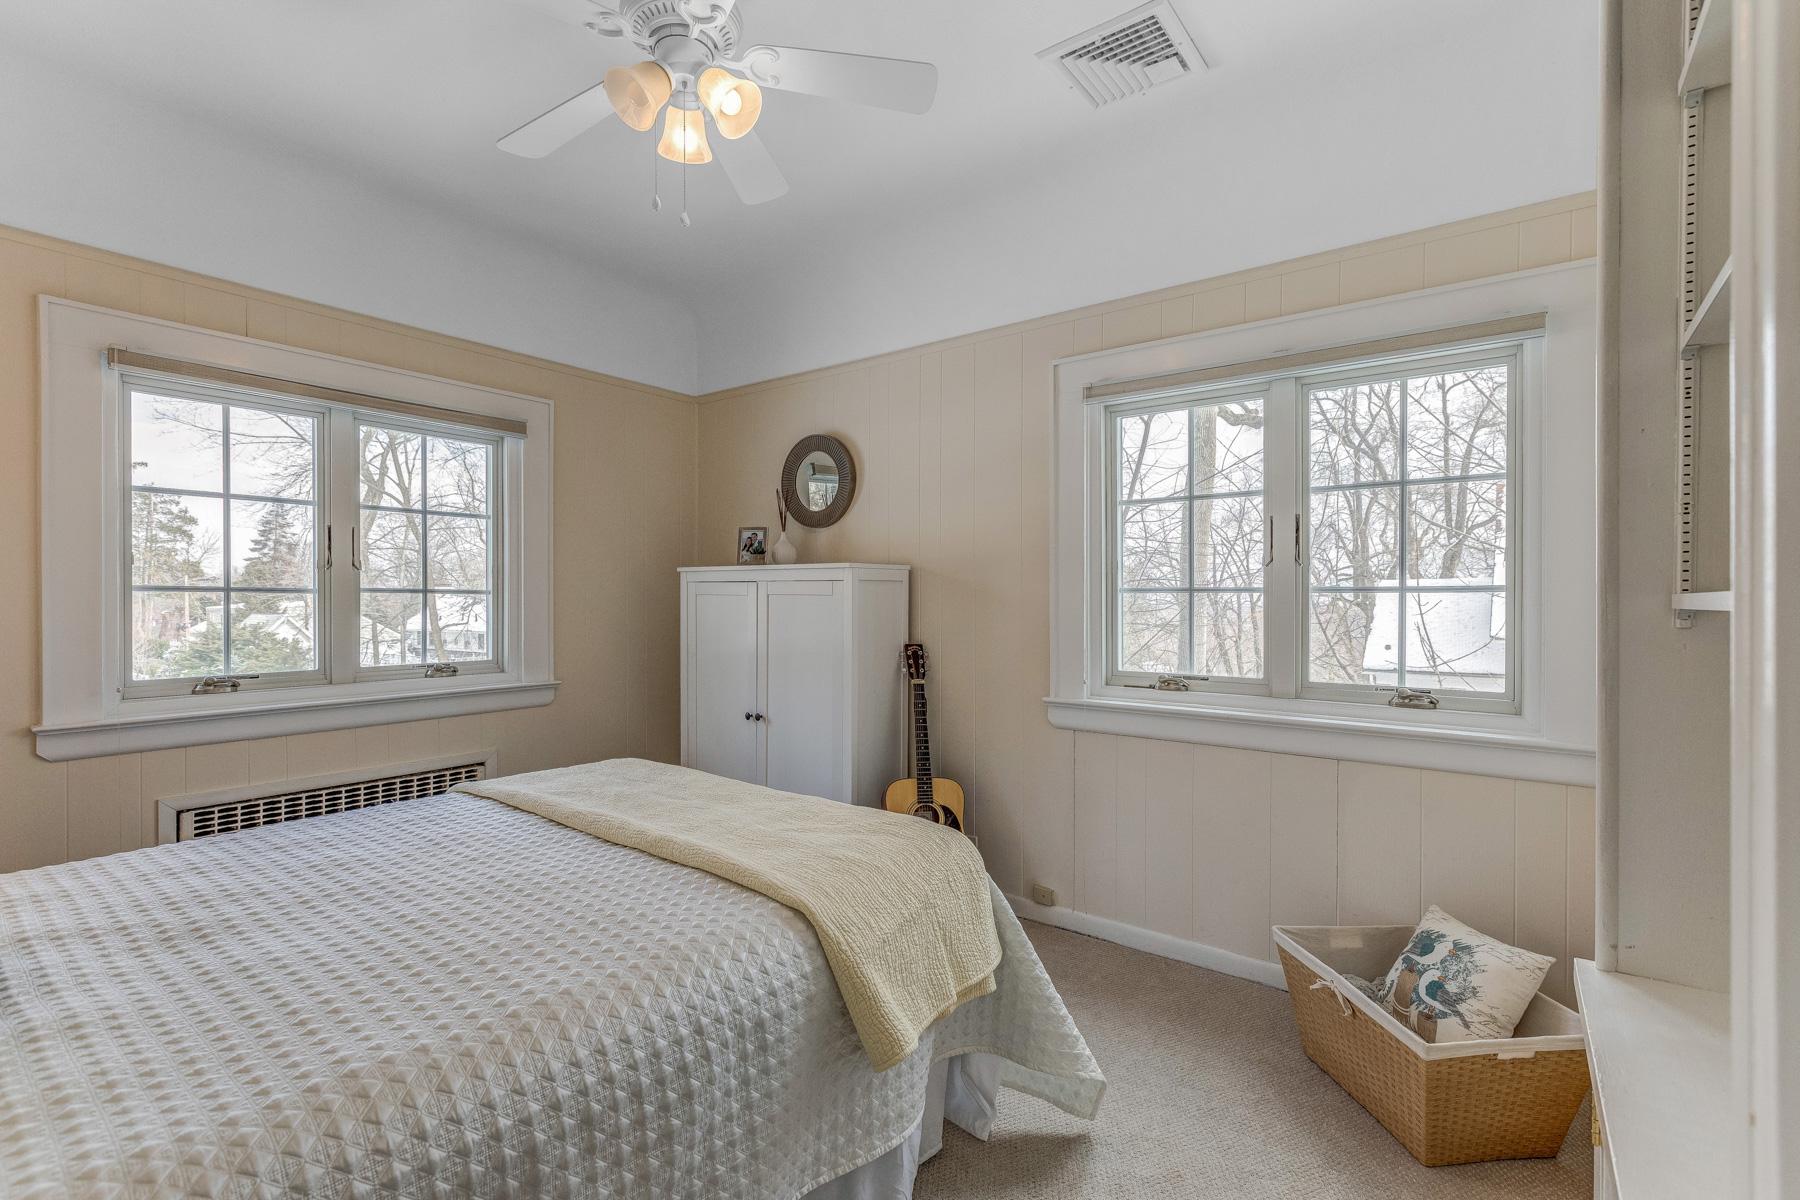 16. Bedroom 4:Guest room_53A9335_6_7